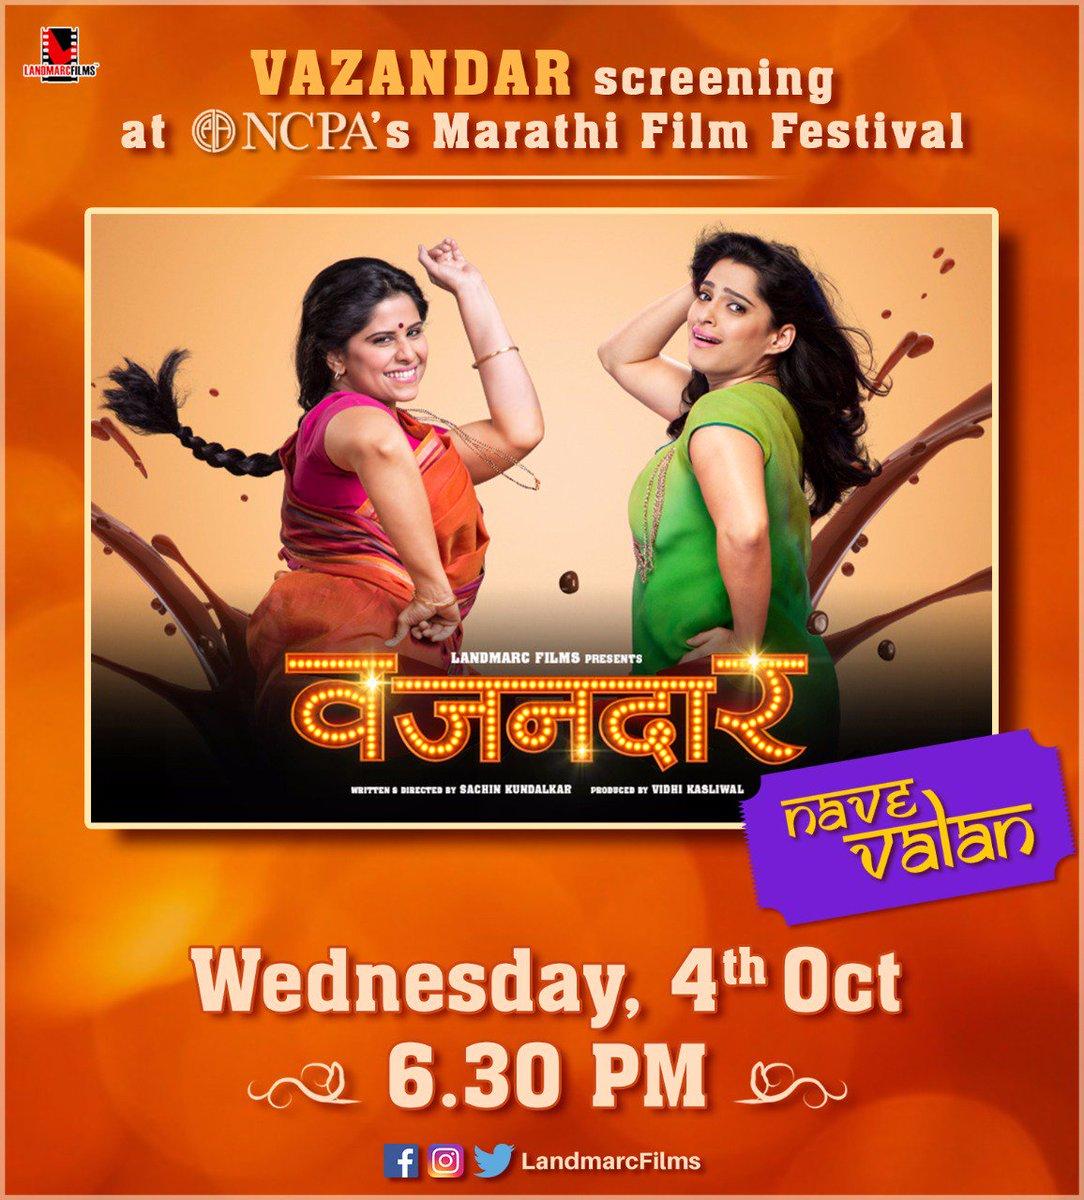 vazandar marathi movie full download